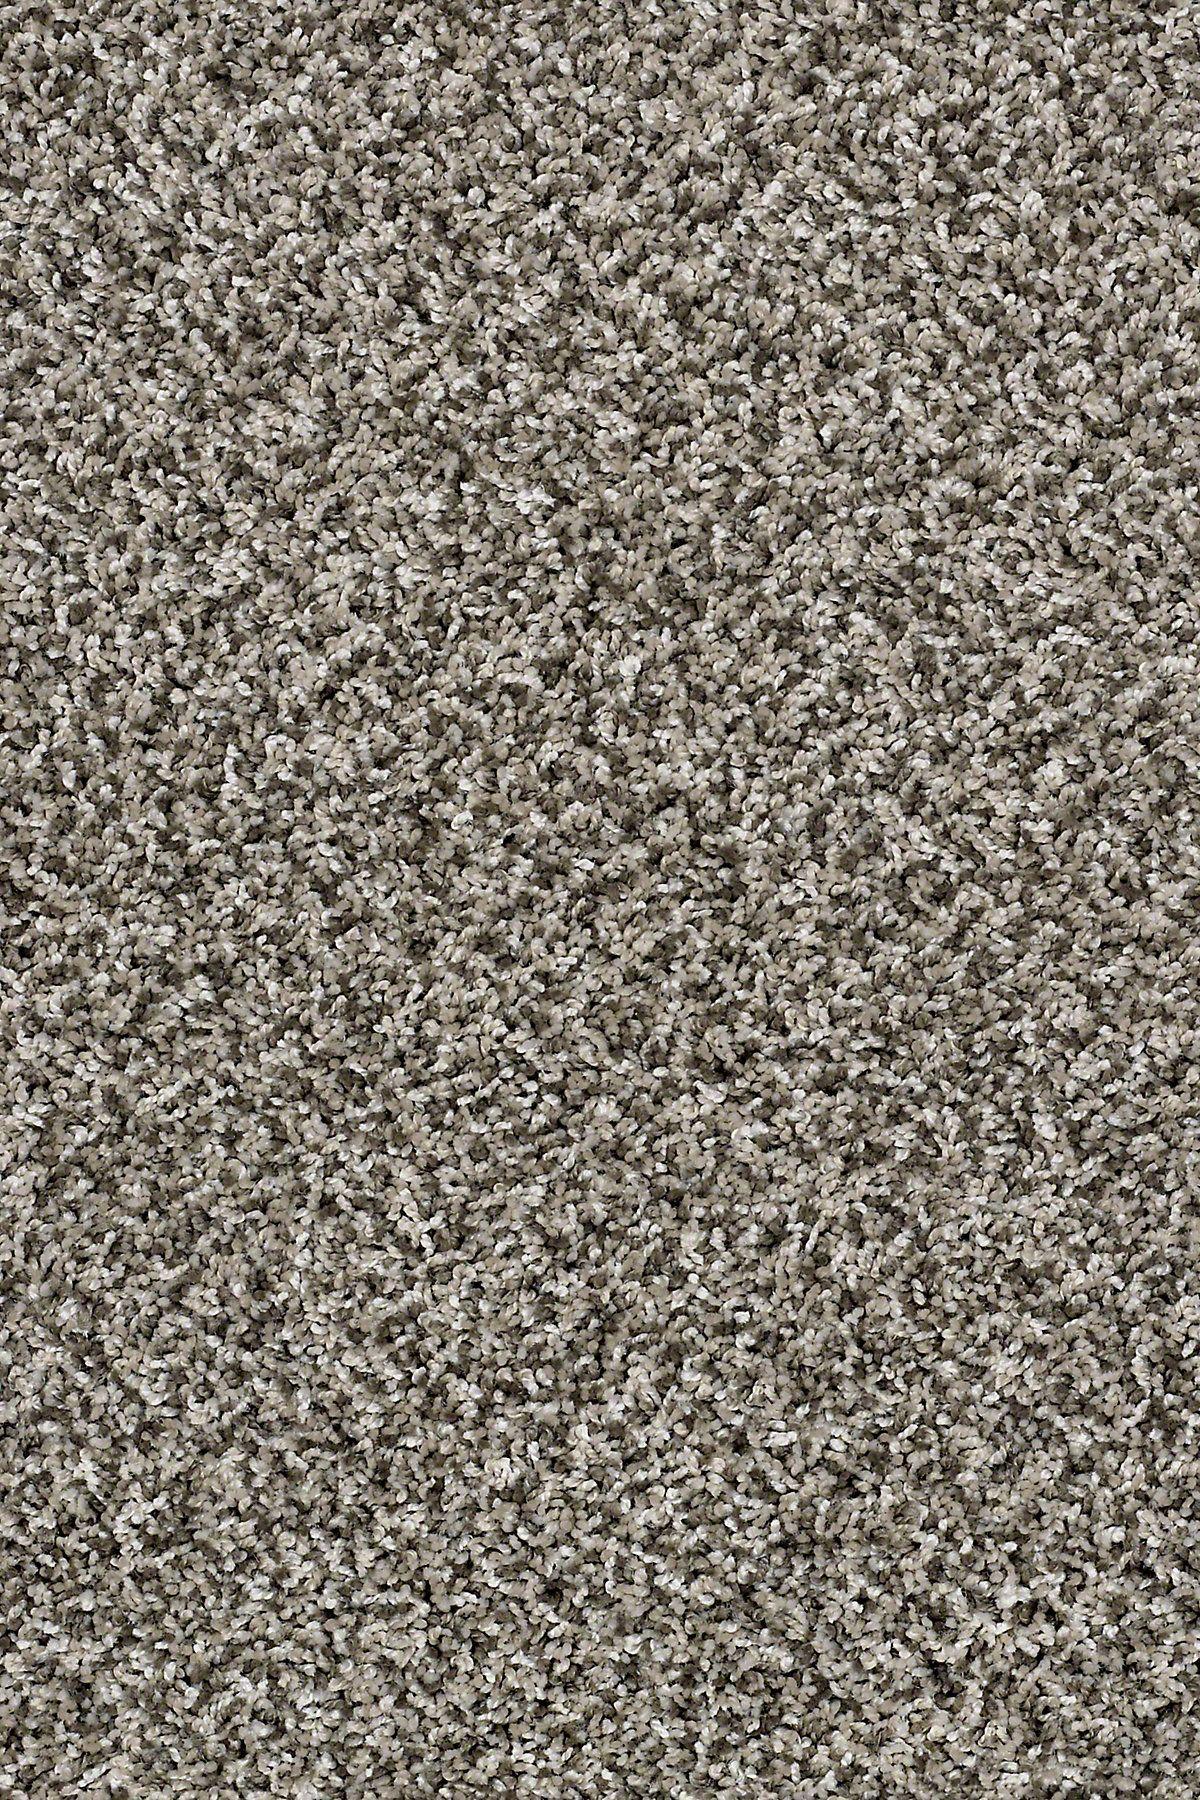 Composure Whisper Ea689 00501 Carpets Sample Shaw Floors Carpet Samples Basement Makeover